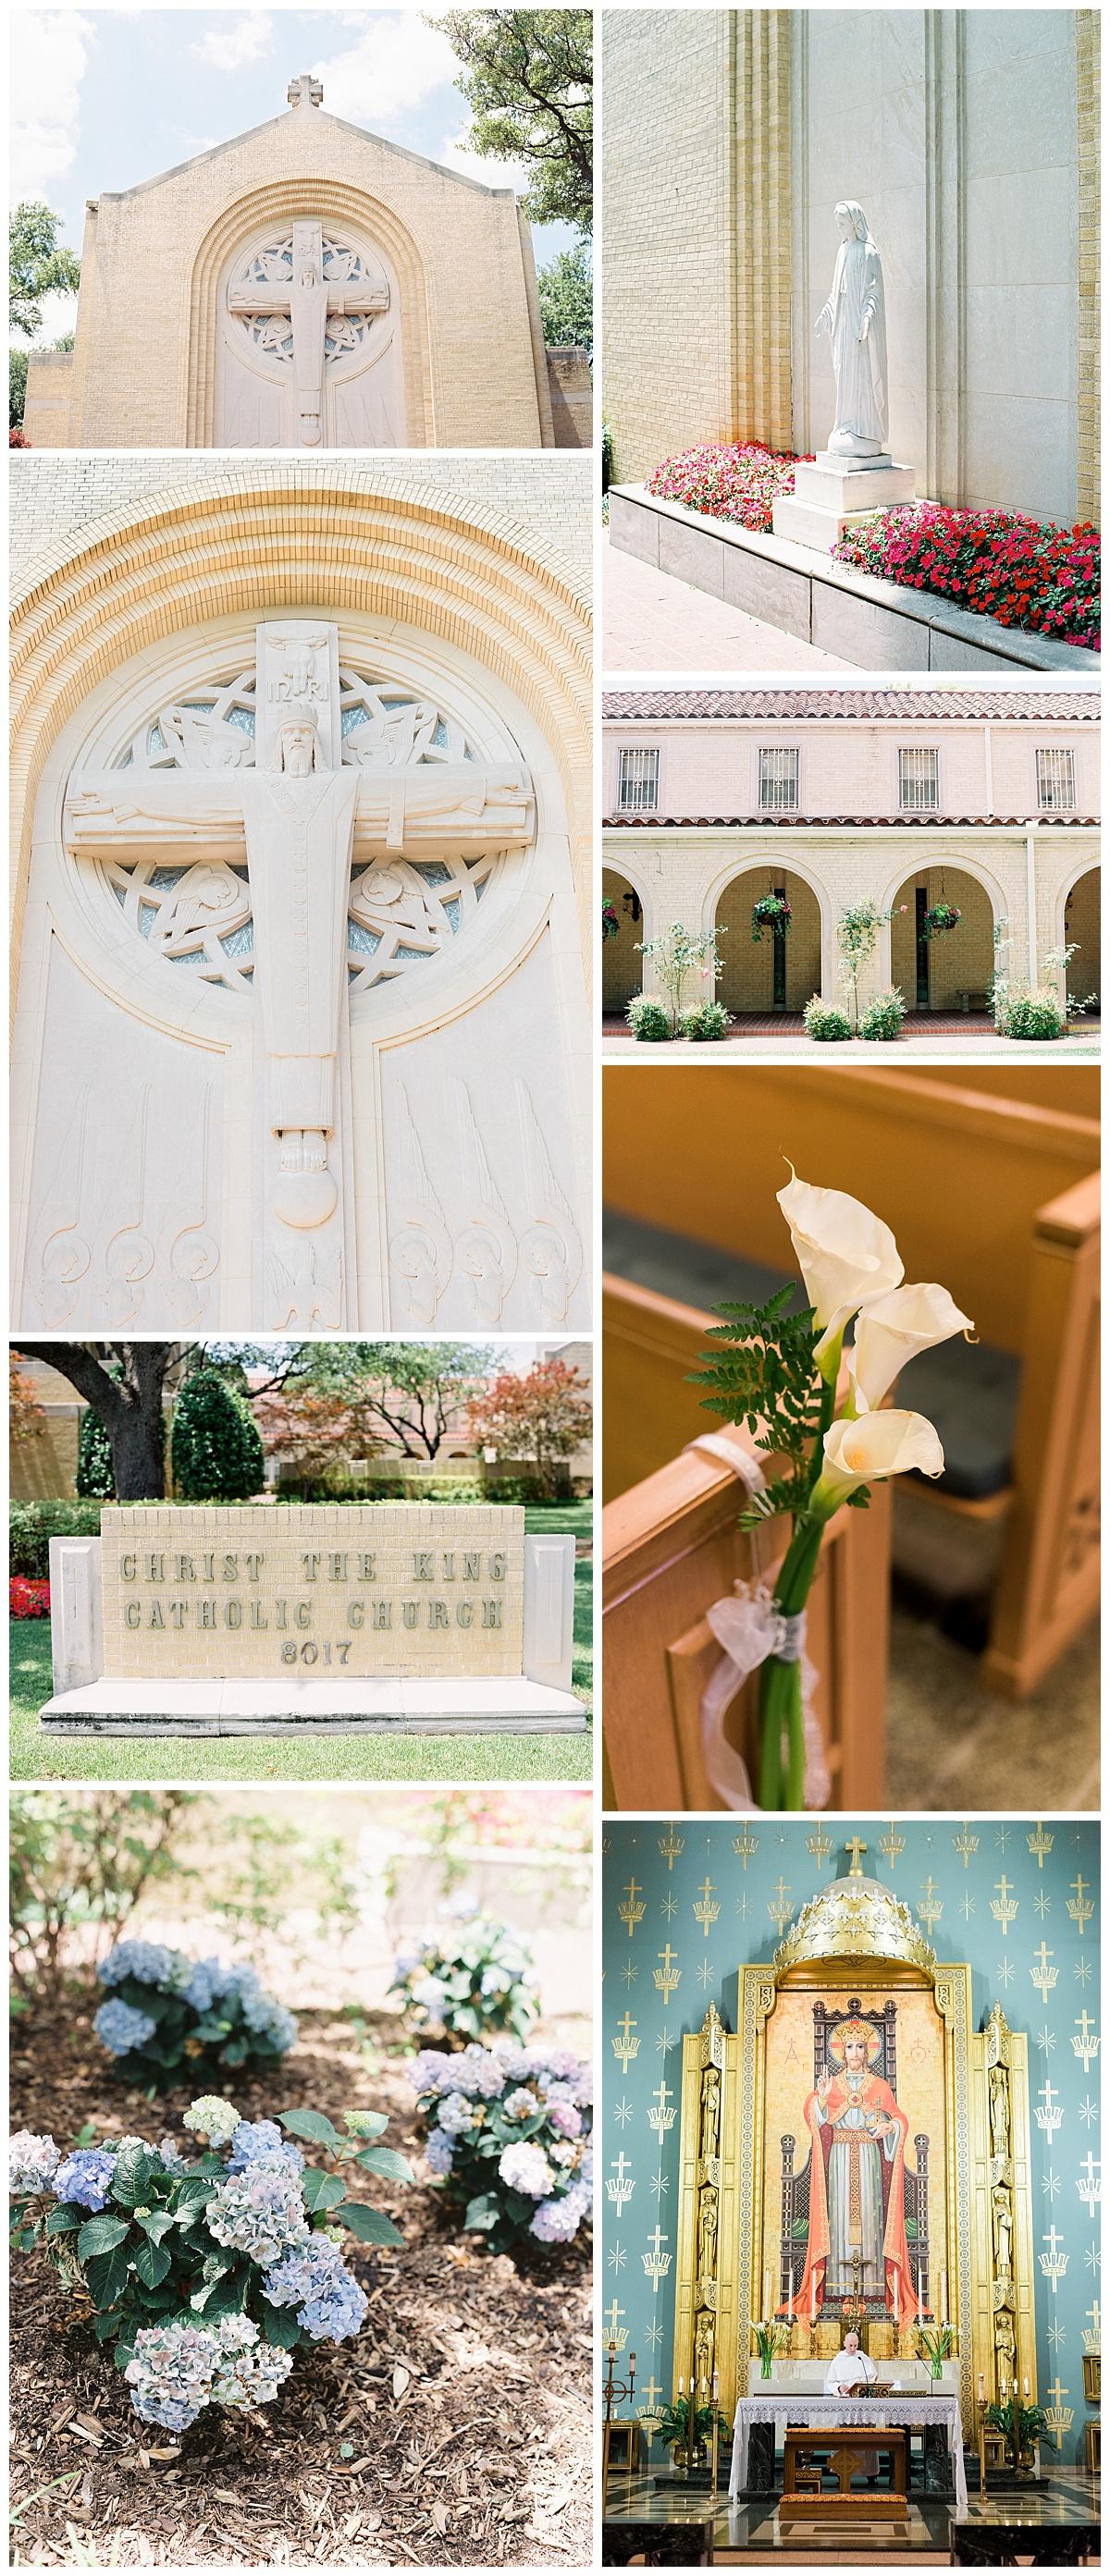 christ-the-king-catholic-church-wedding-ar-photography-3.jpg